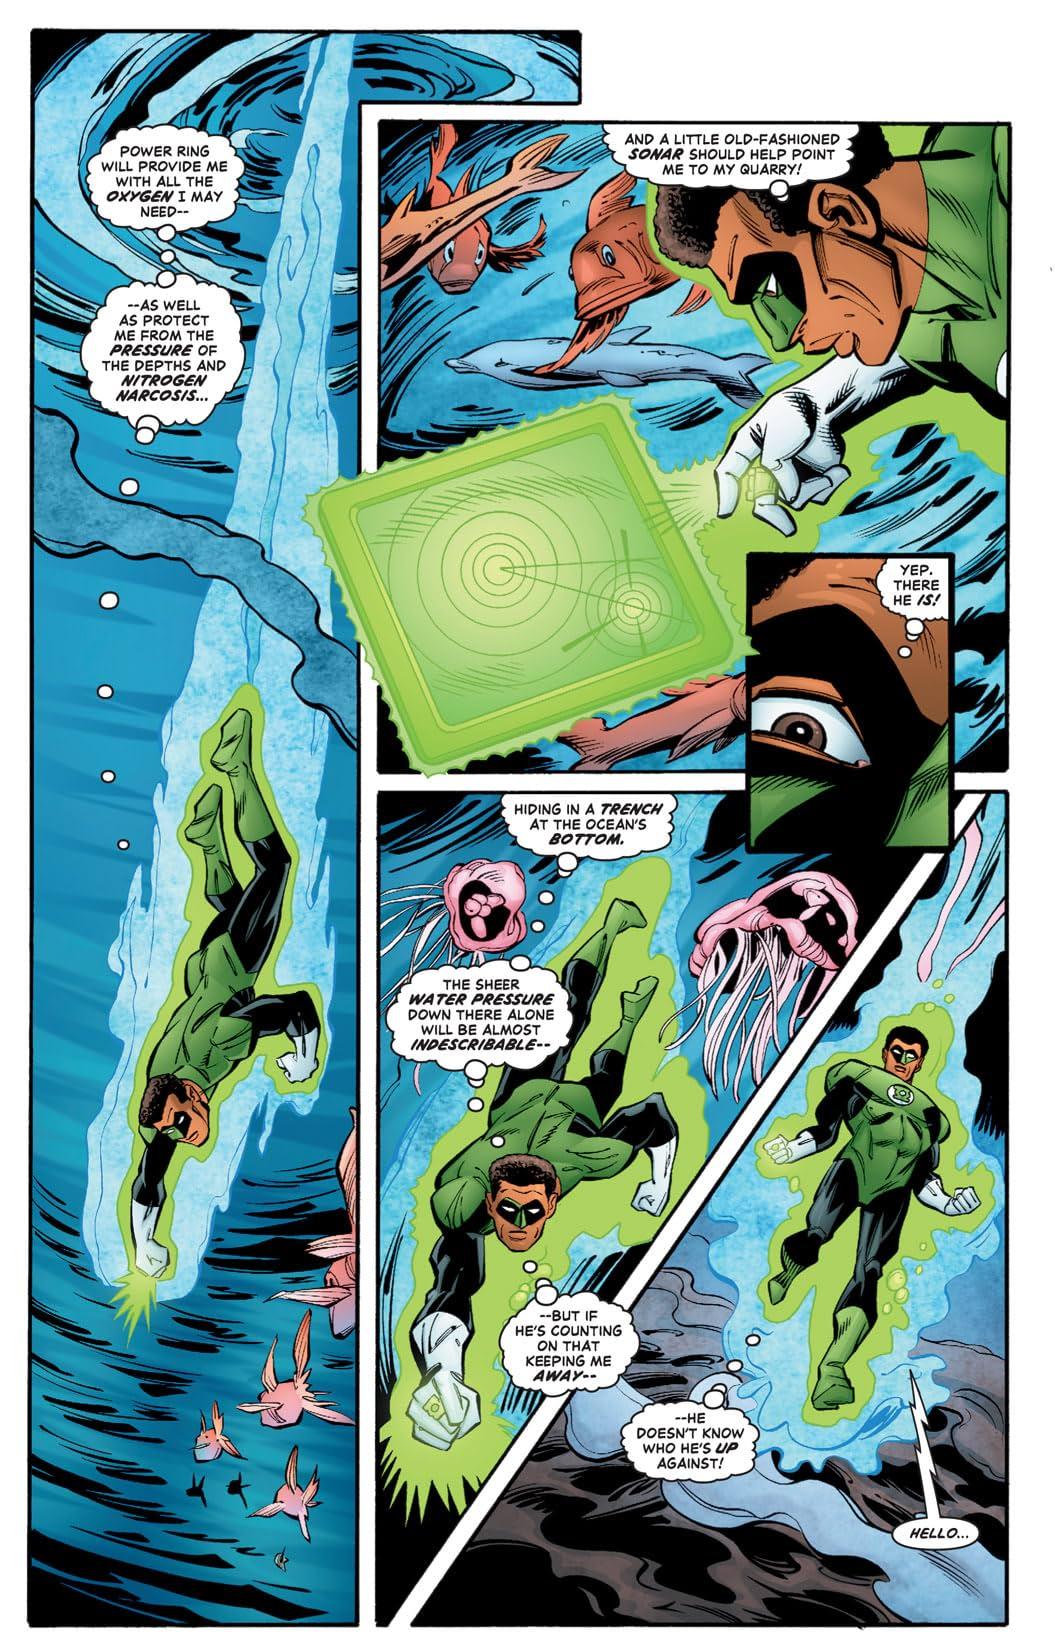 DC Retroactive: Green Lantern - the 80s #1